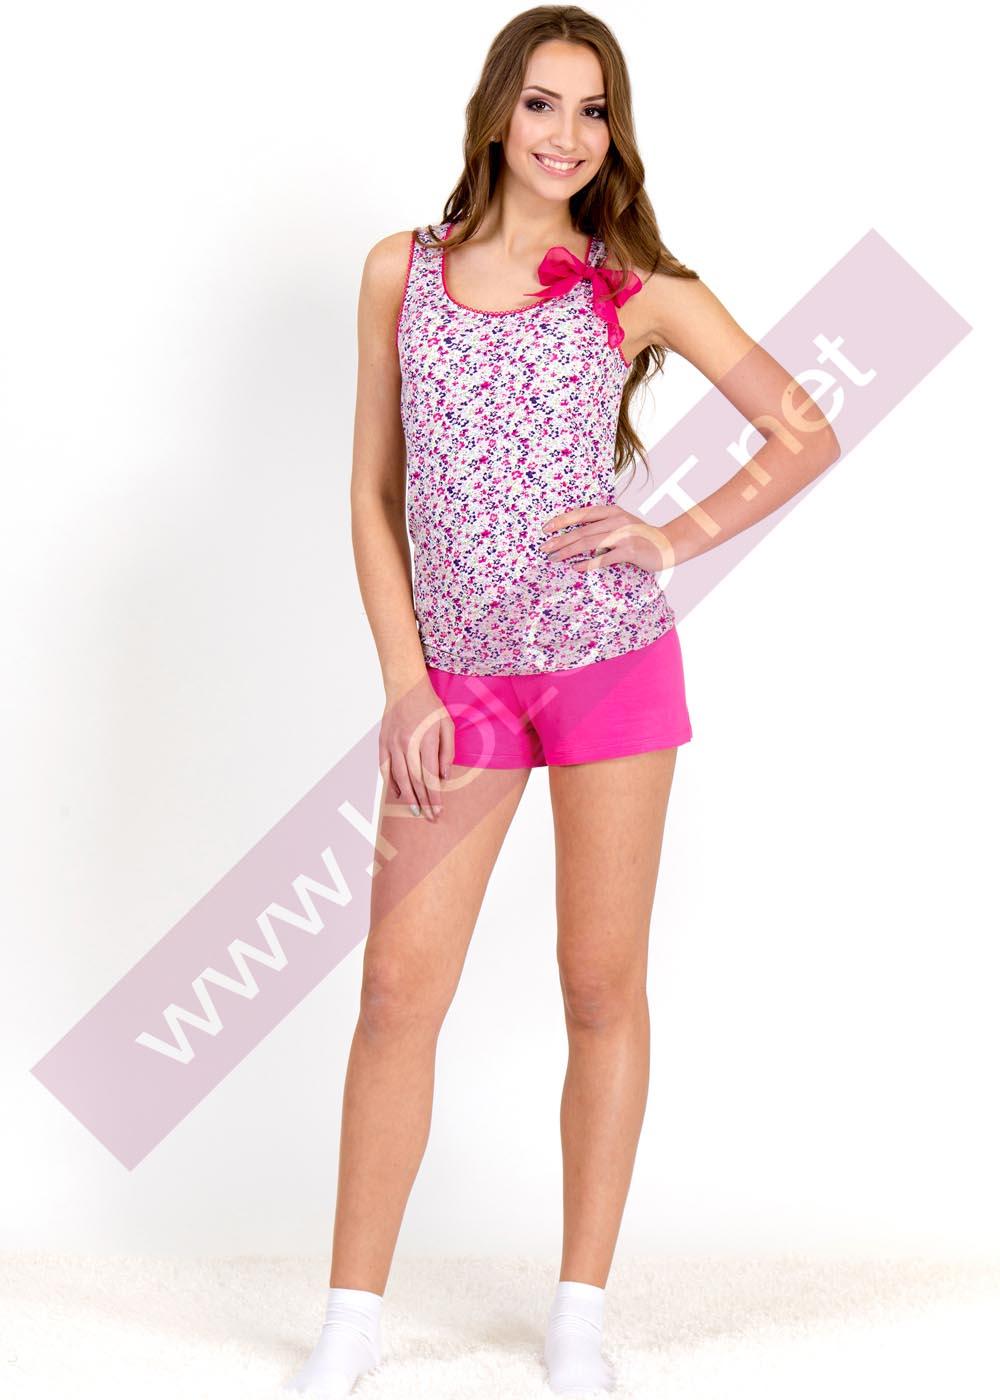 Домашняя одежда Домашний комплект майка + шорты Bright Bow 01312